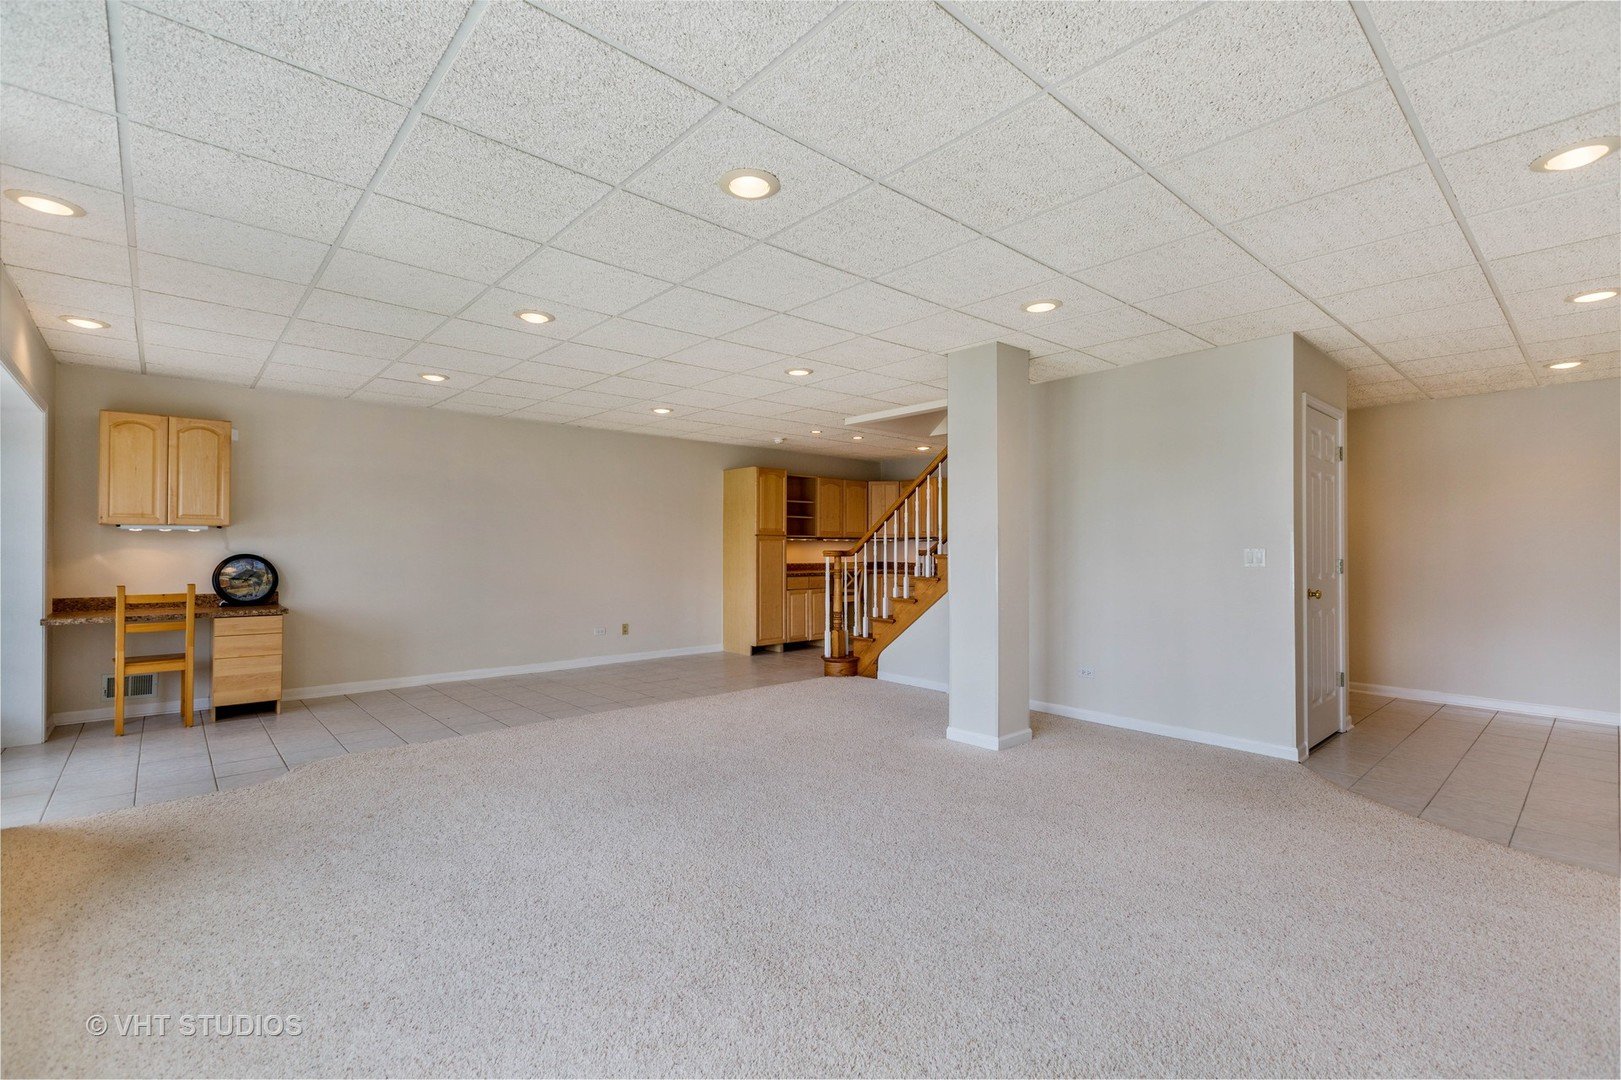 212 West Belvidere, Grayslake, Illinois, 60030